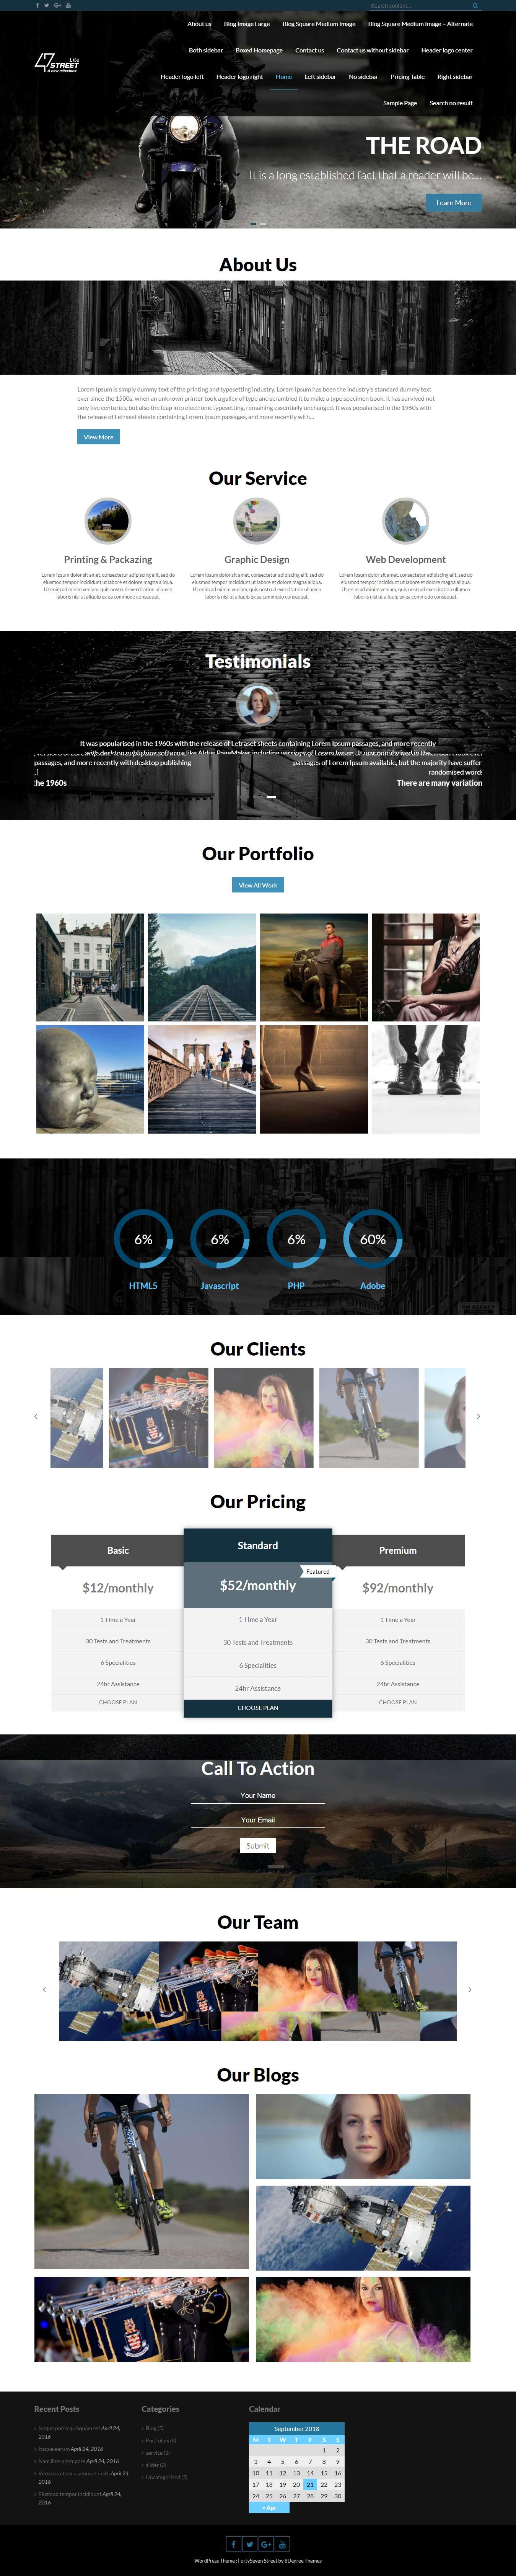 FortySeven Street - Mejor tema premium multipropósito de WordPress